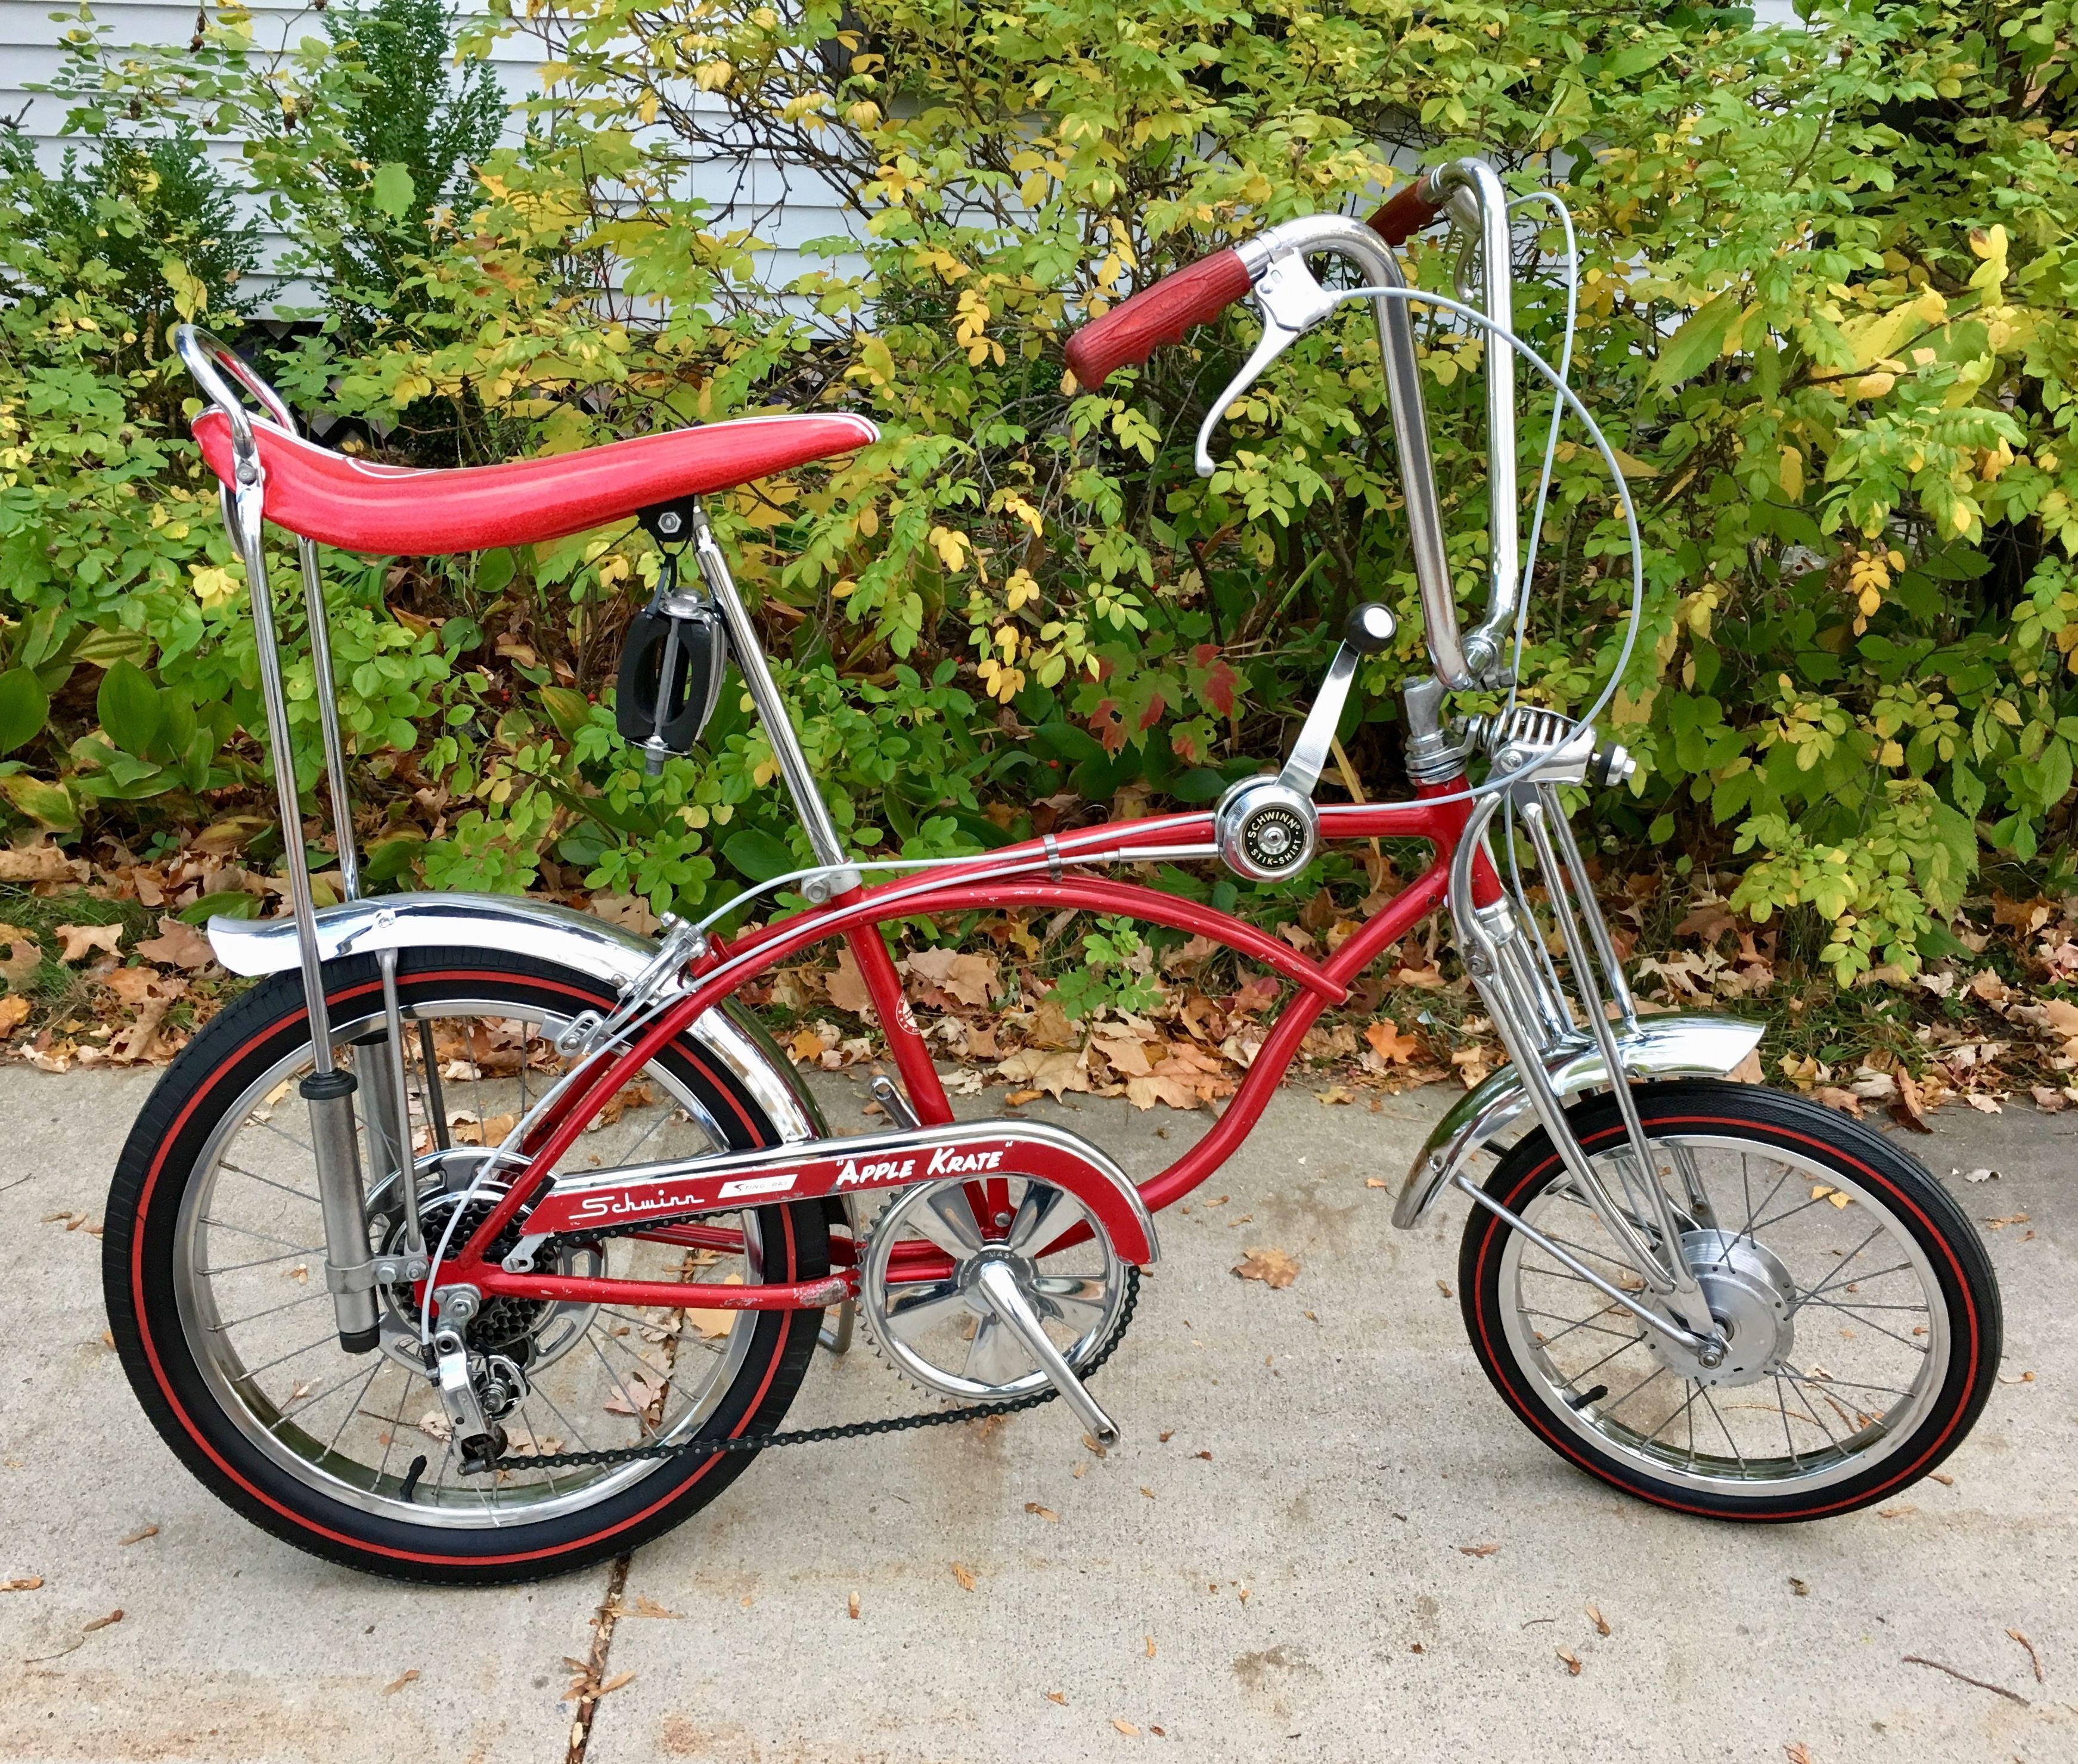 Red Sparkle Vintage Schwinn Stingray Type Bike Grips Lowrider Bicycle Cruiser